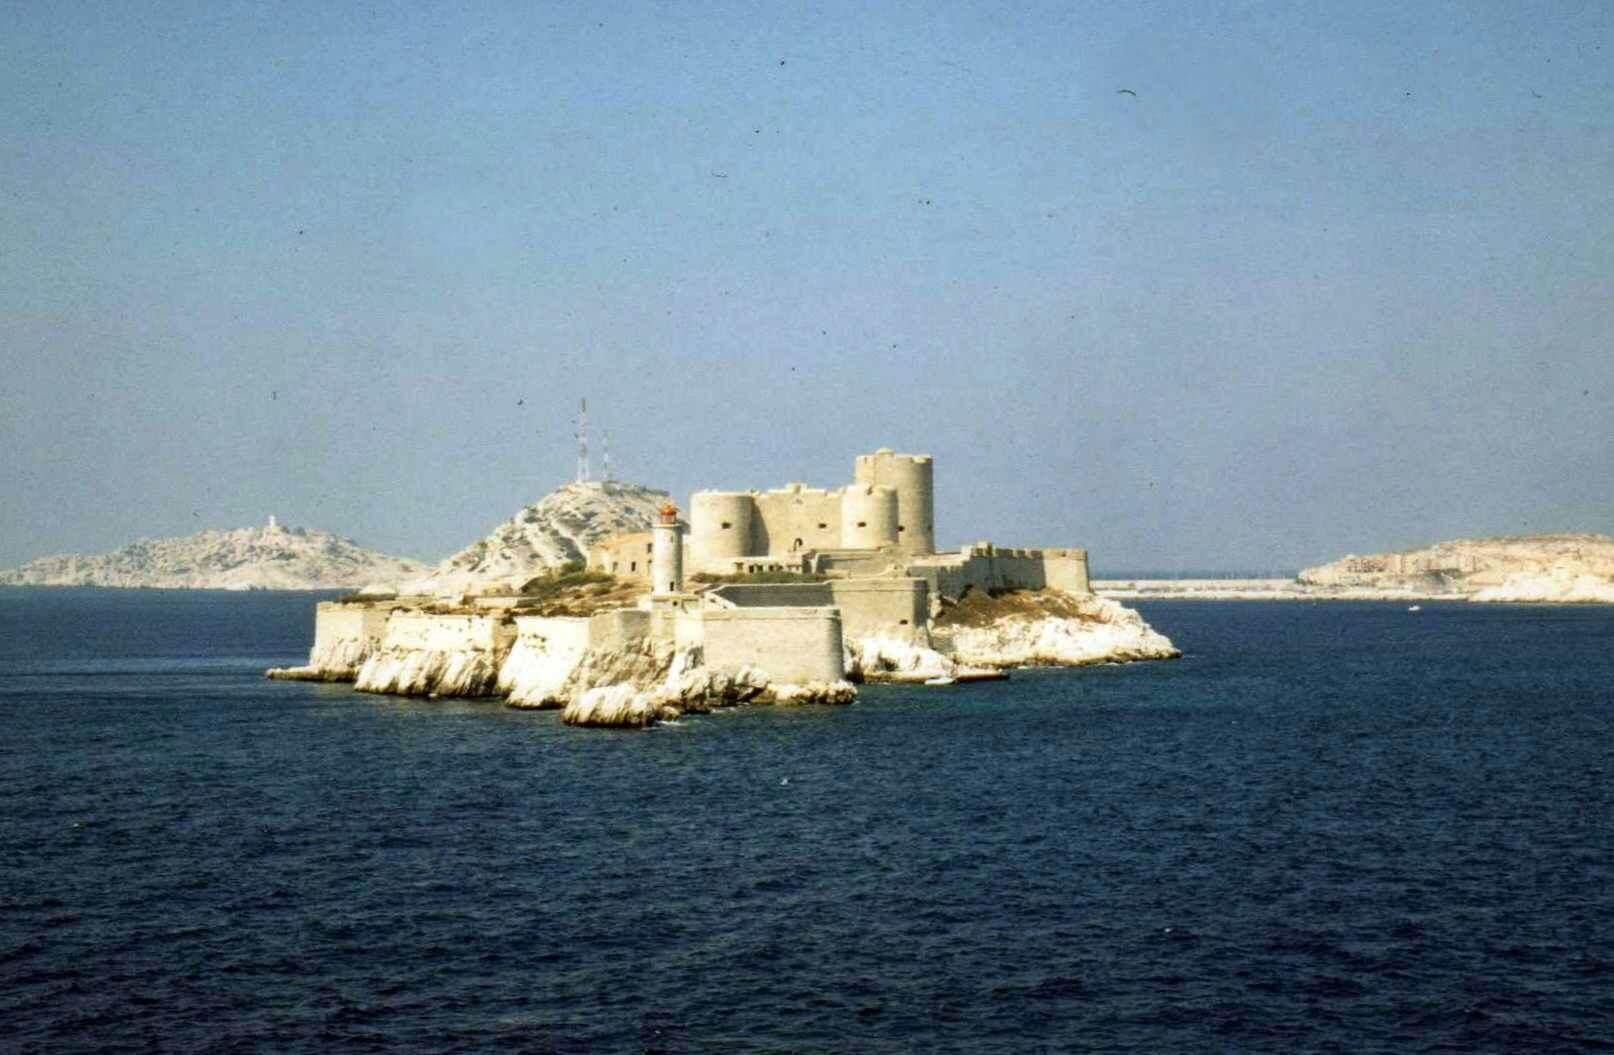 Raid moto 4x4 Tunisie Tunis Djerba Wild Spot Raid moto 4x4 Tunisie Tunis Djerba Wild Spot chateau d'if